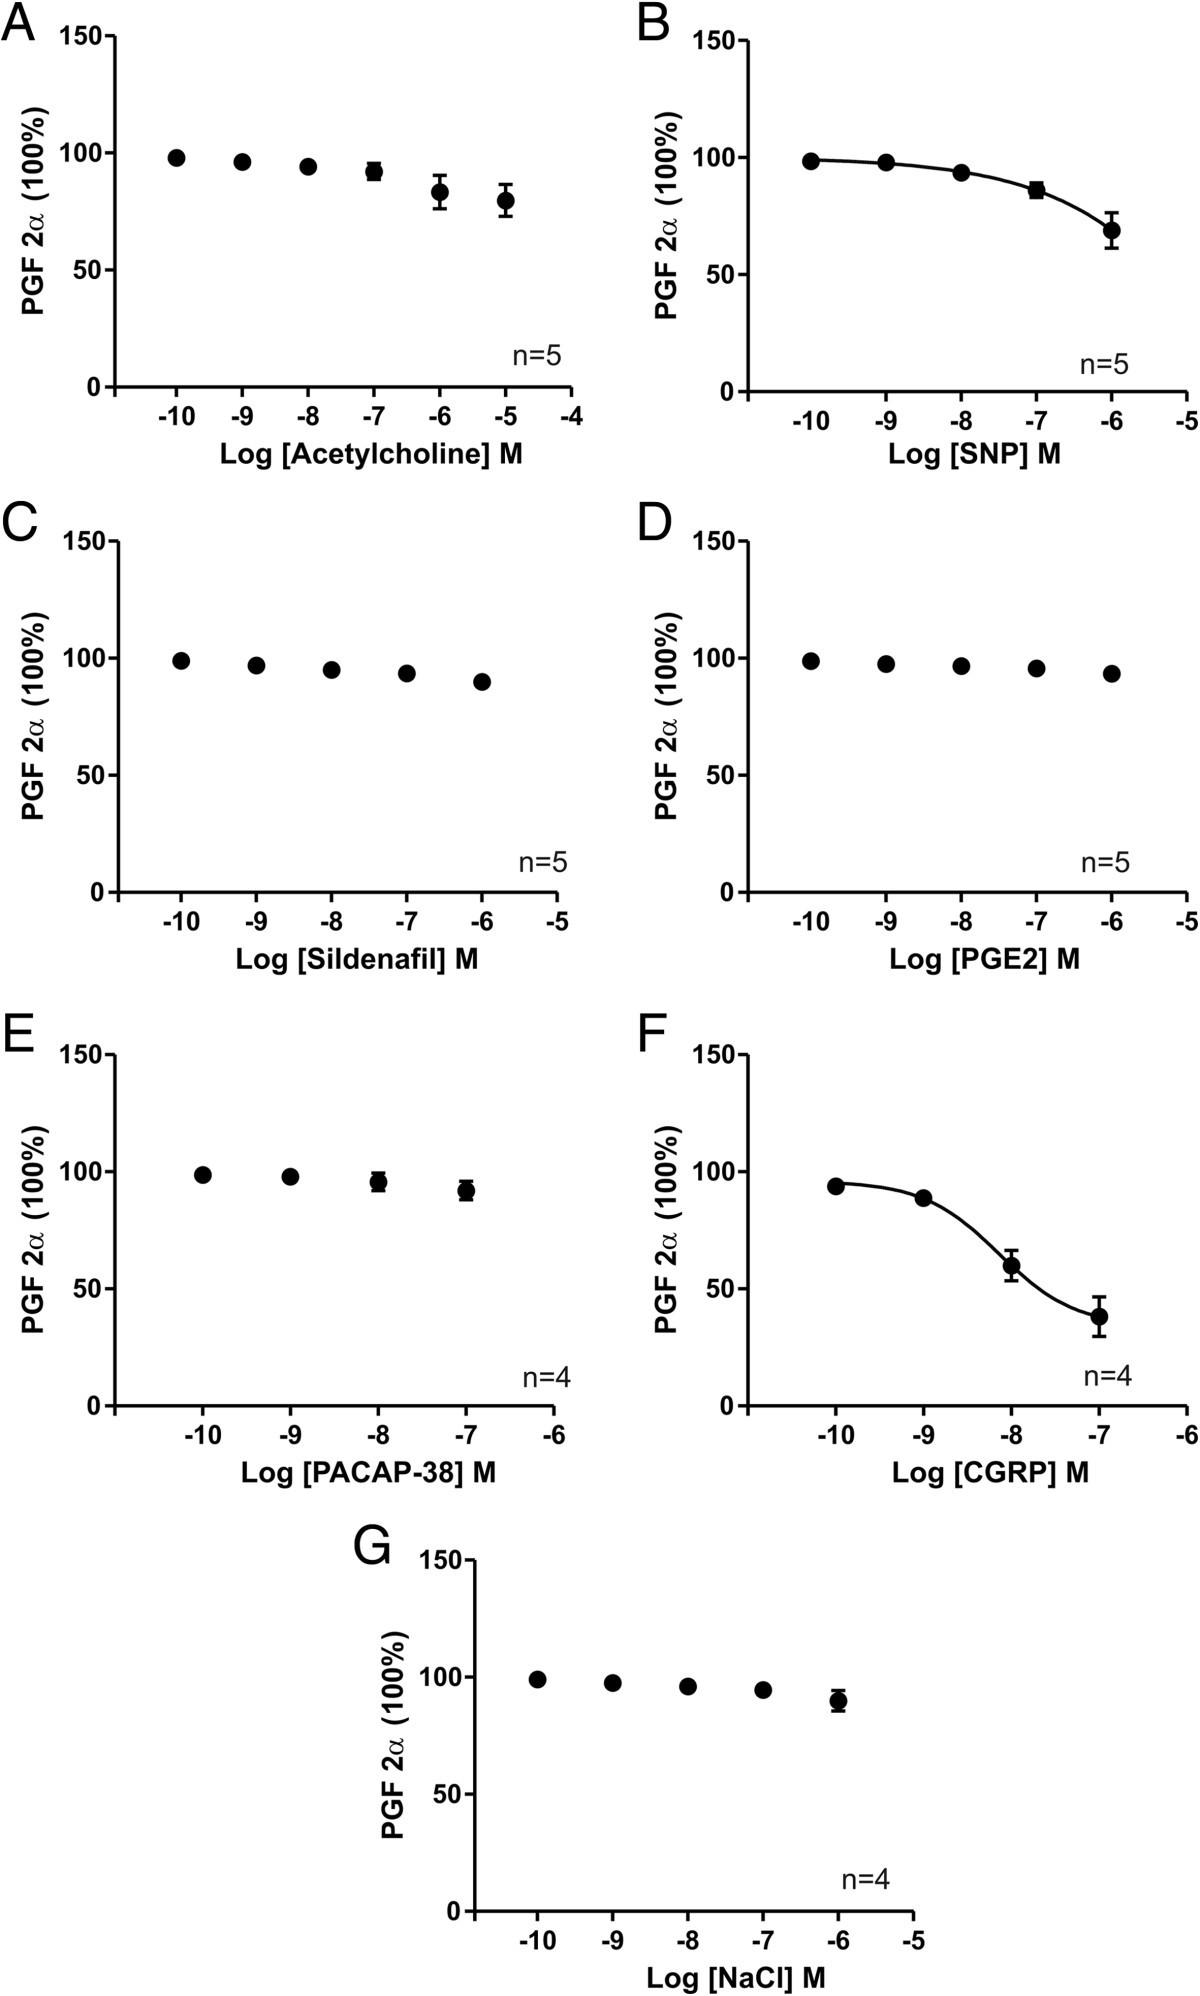 Comparison Of The Vasodilator Responses Isolated Human And Rat Sprague Wiring Diagram Heated Mirrors Figure 1